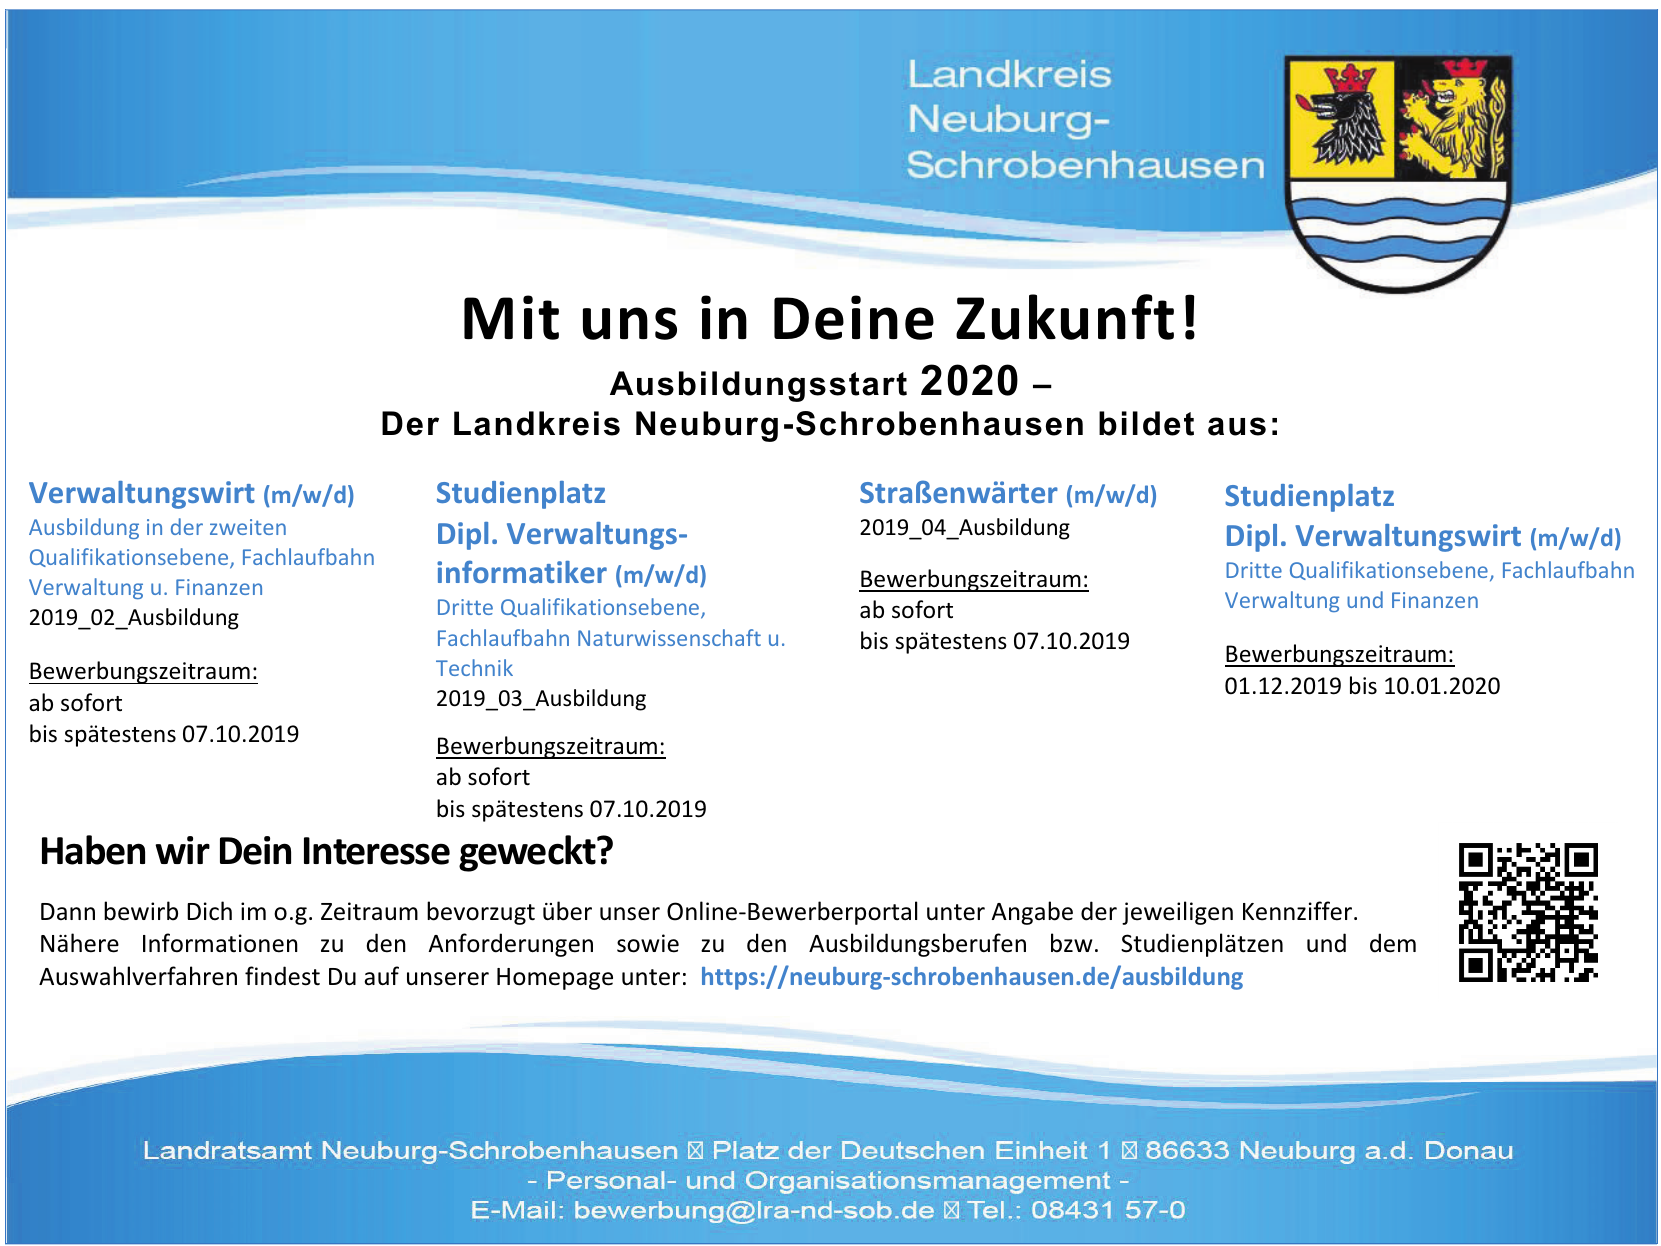 Landratsamt Neuburg